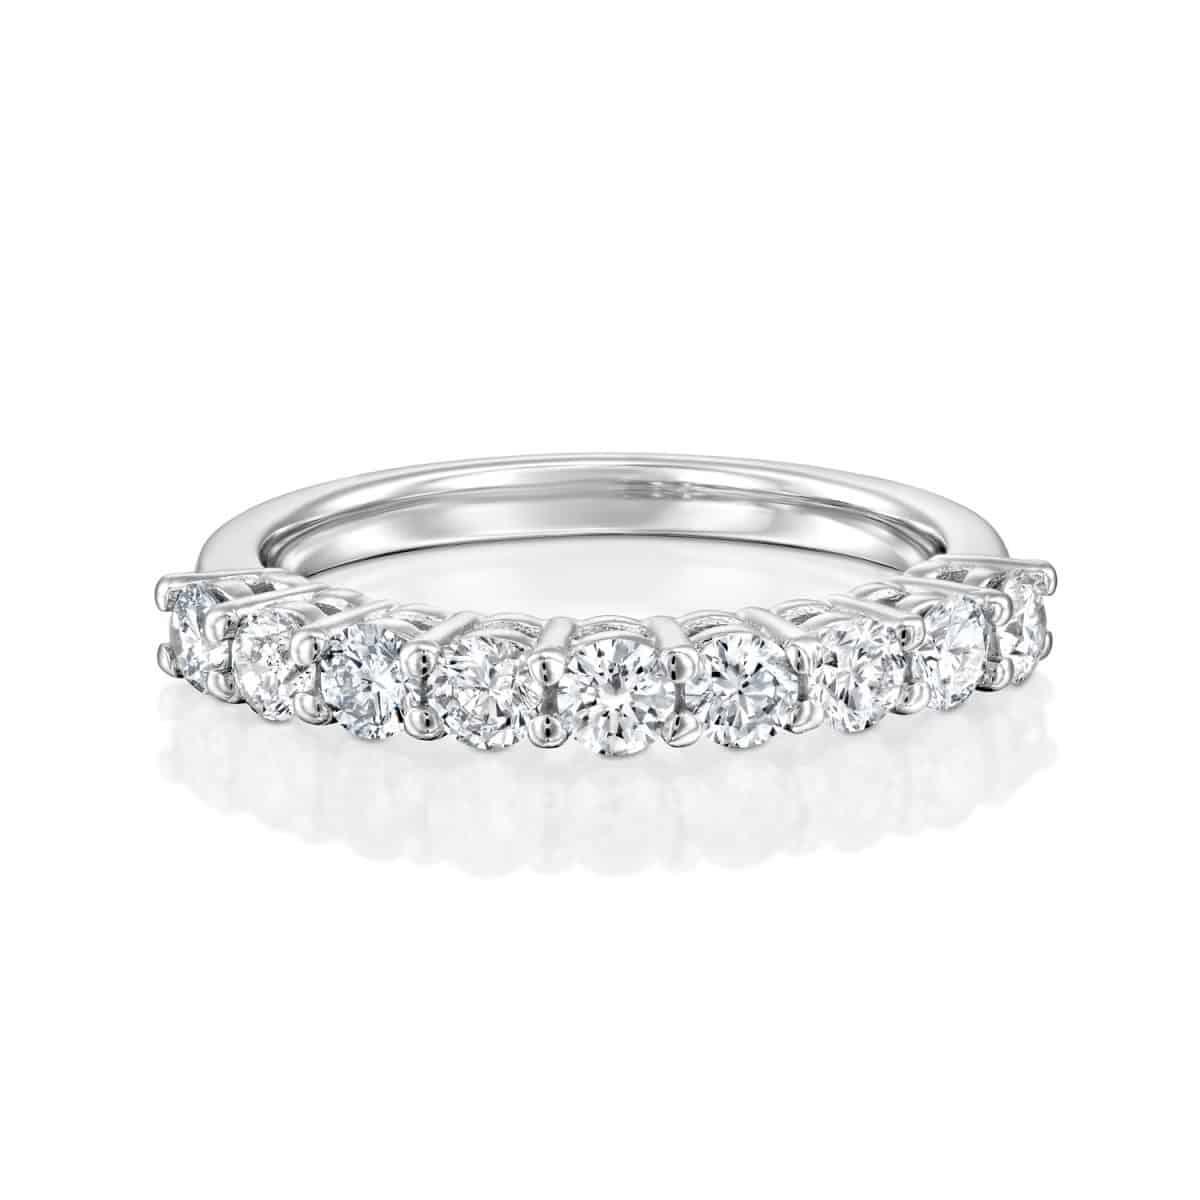 Inlay Lab Grown Diamond Engagement Ring 0.85ct. - lay